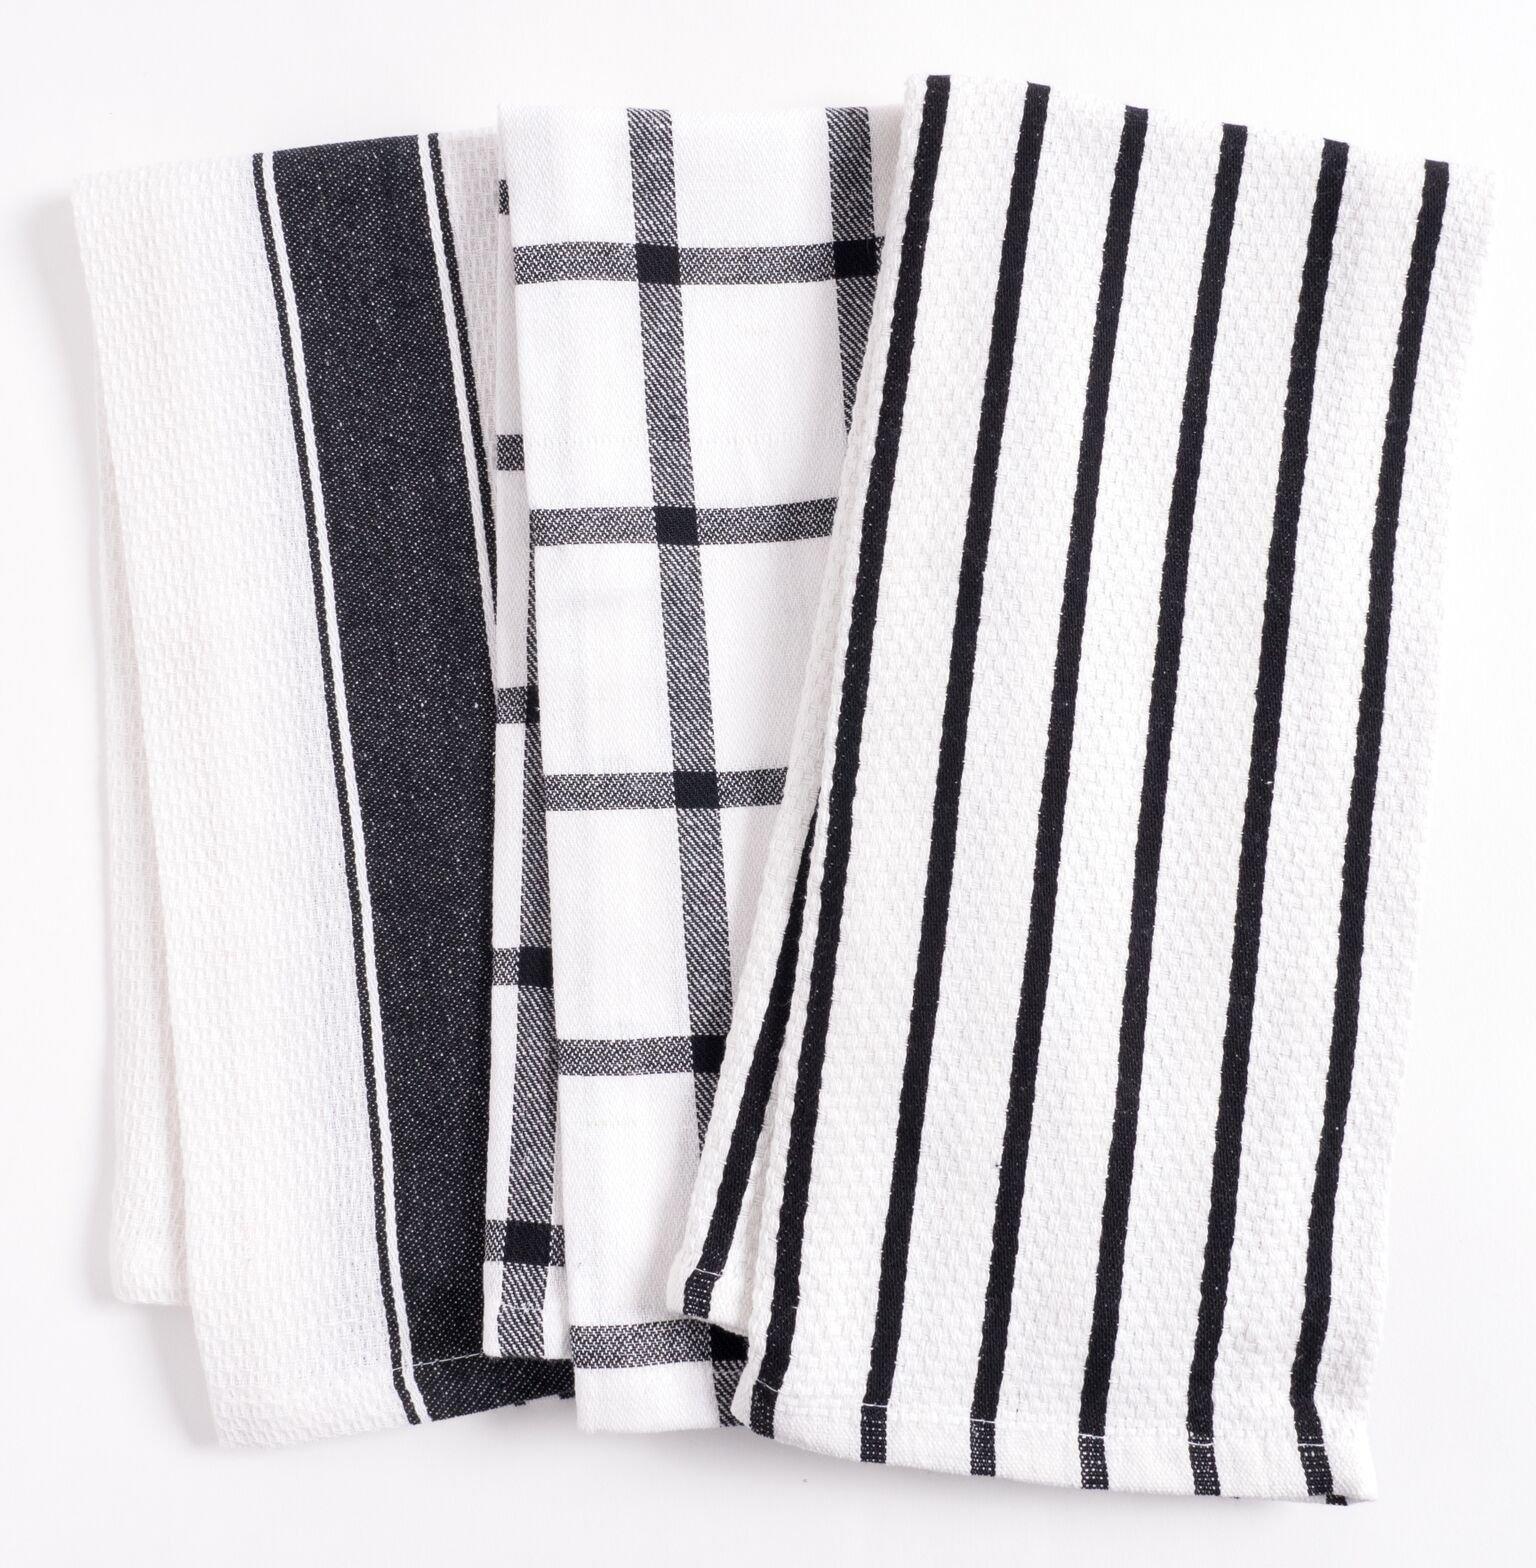 KAF Home Pantry Cuisine Kitchen Towels, Set of 6 100% Cotton Mixed Kitchen Towel Set (18 x 28 Inches) - Black